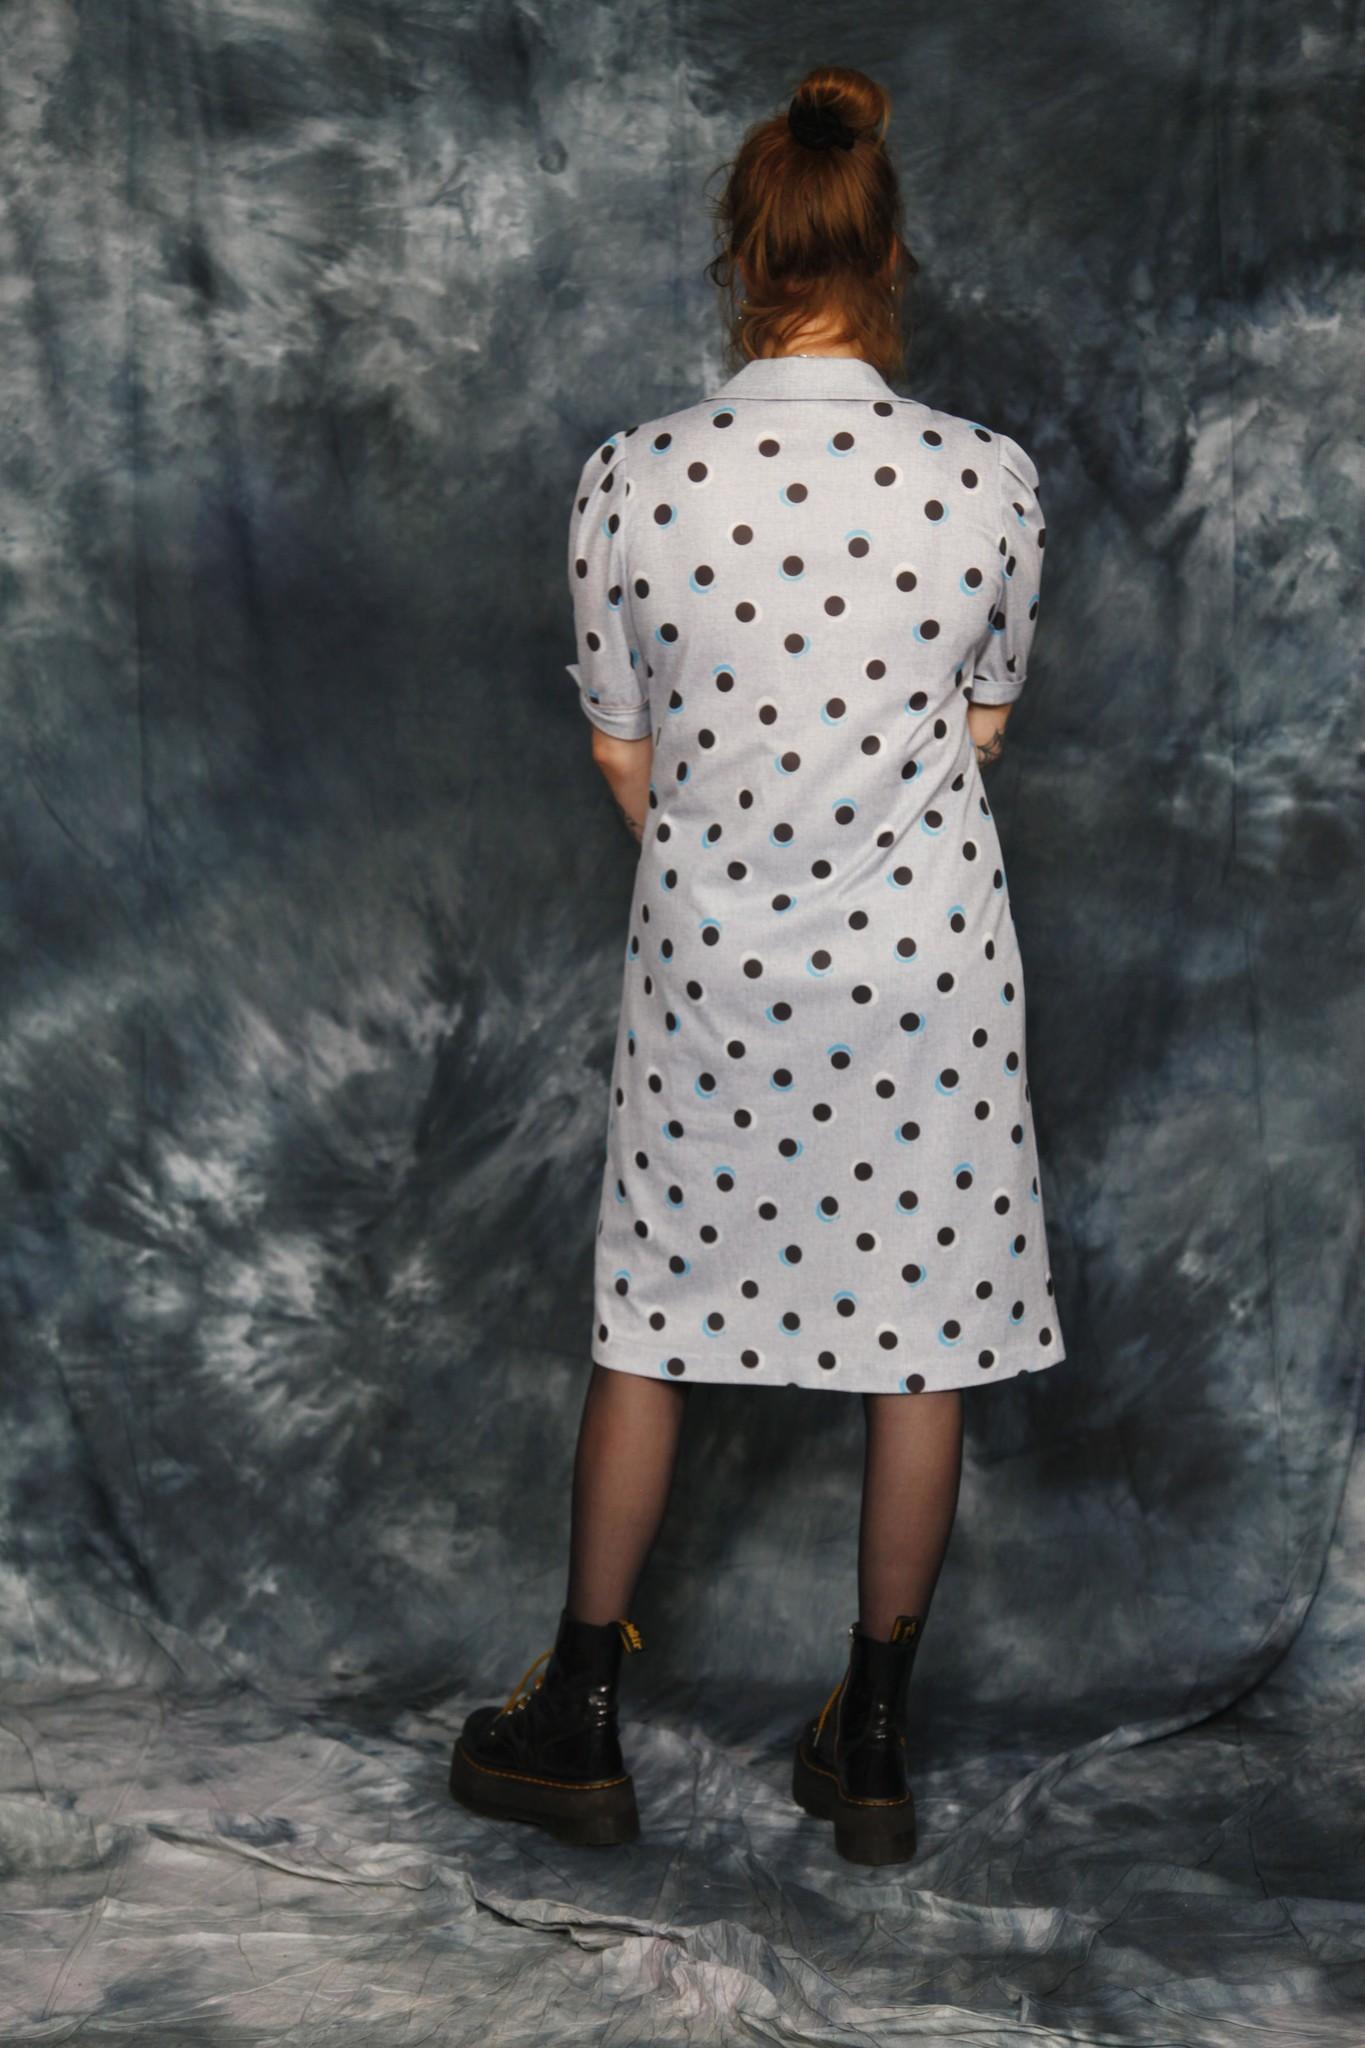 Grey 80s polka dot dress